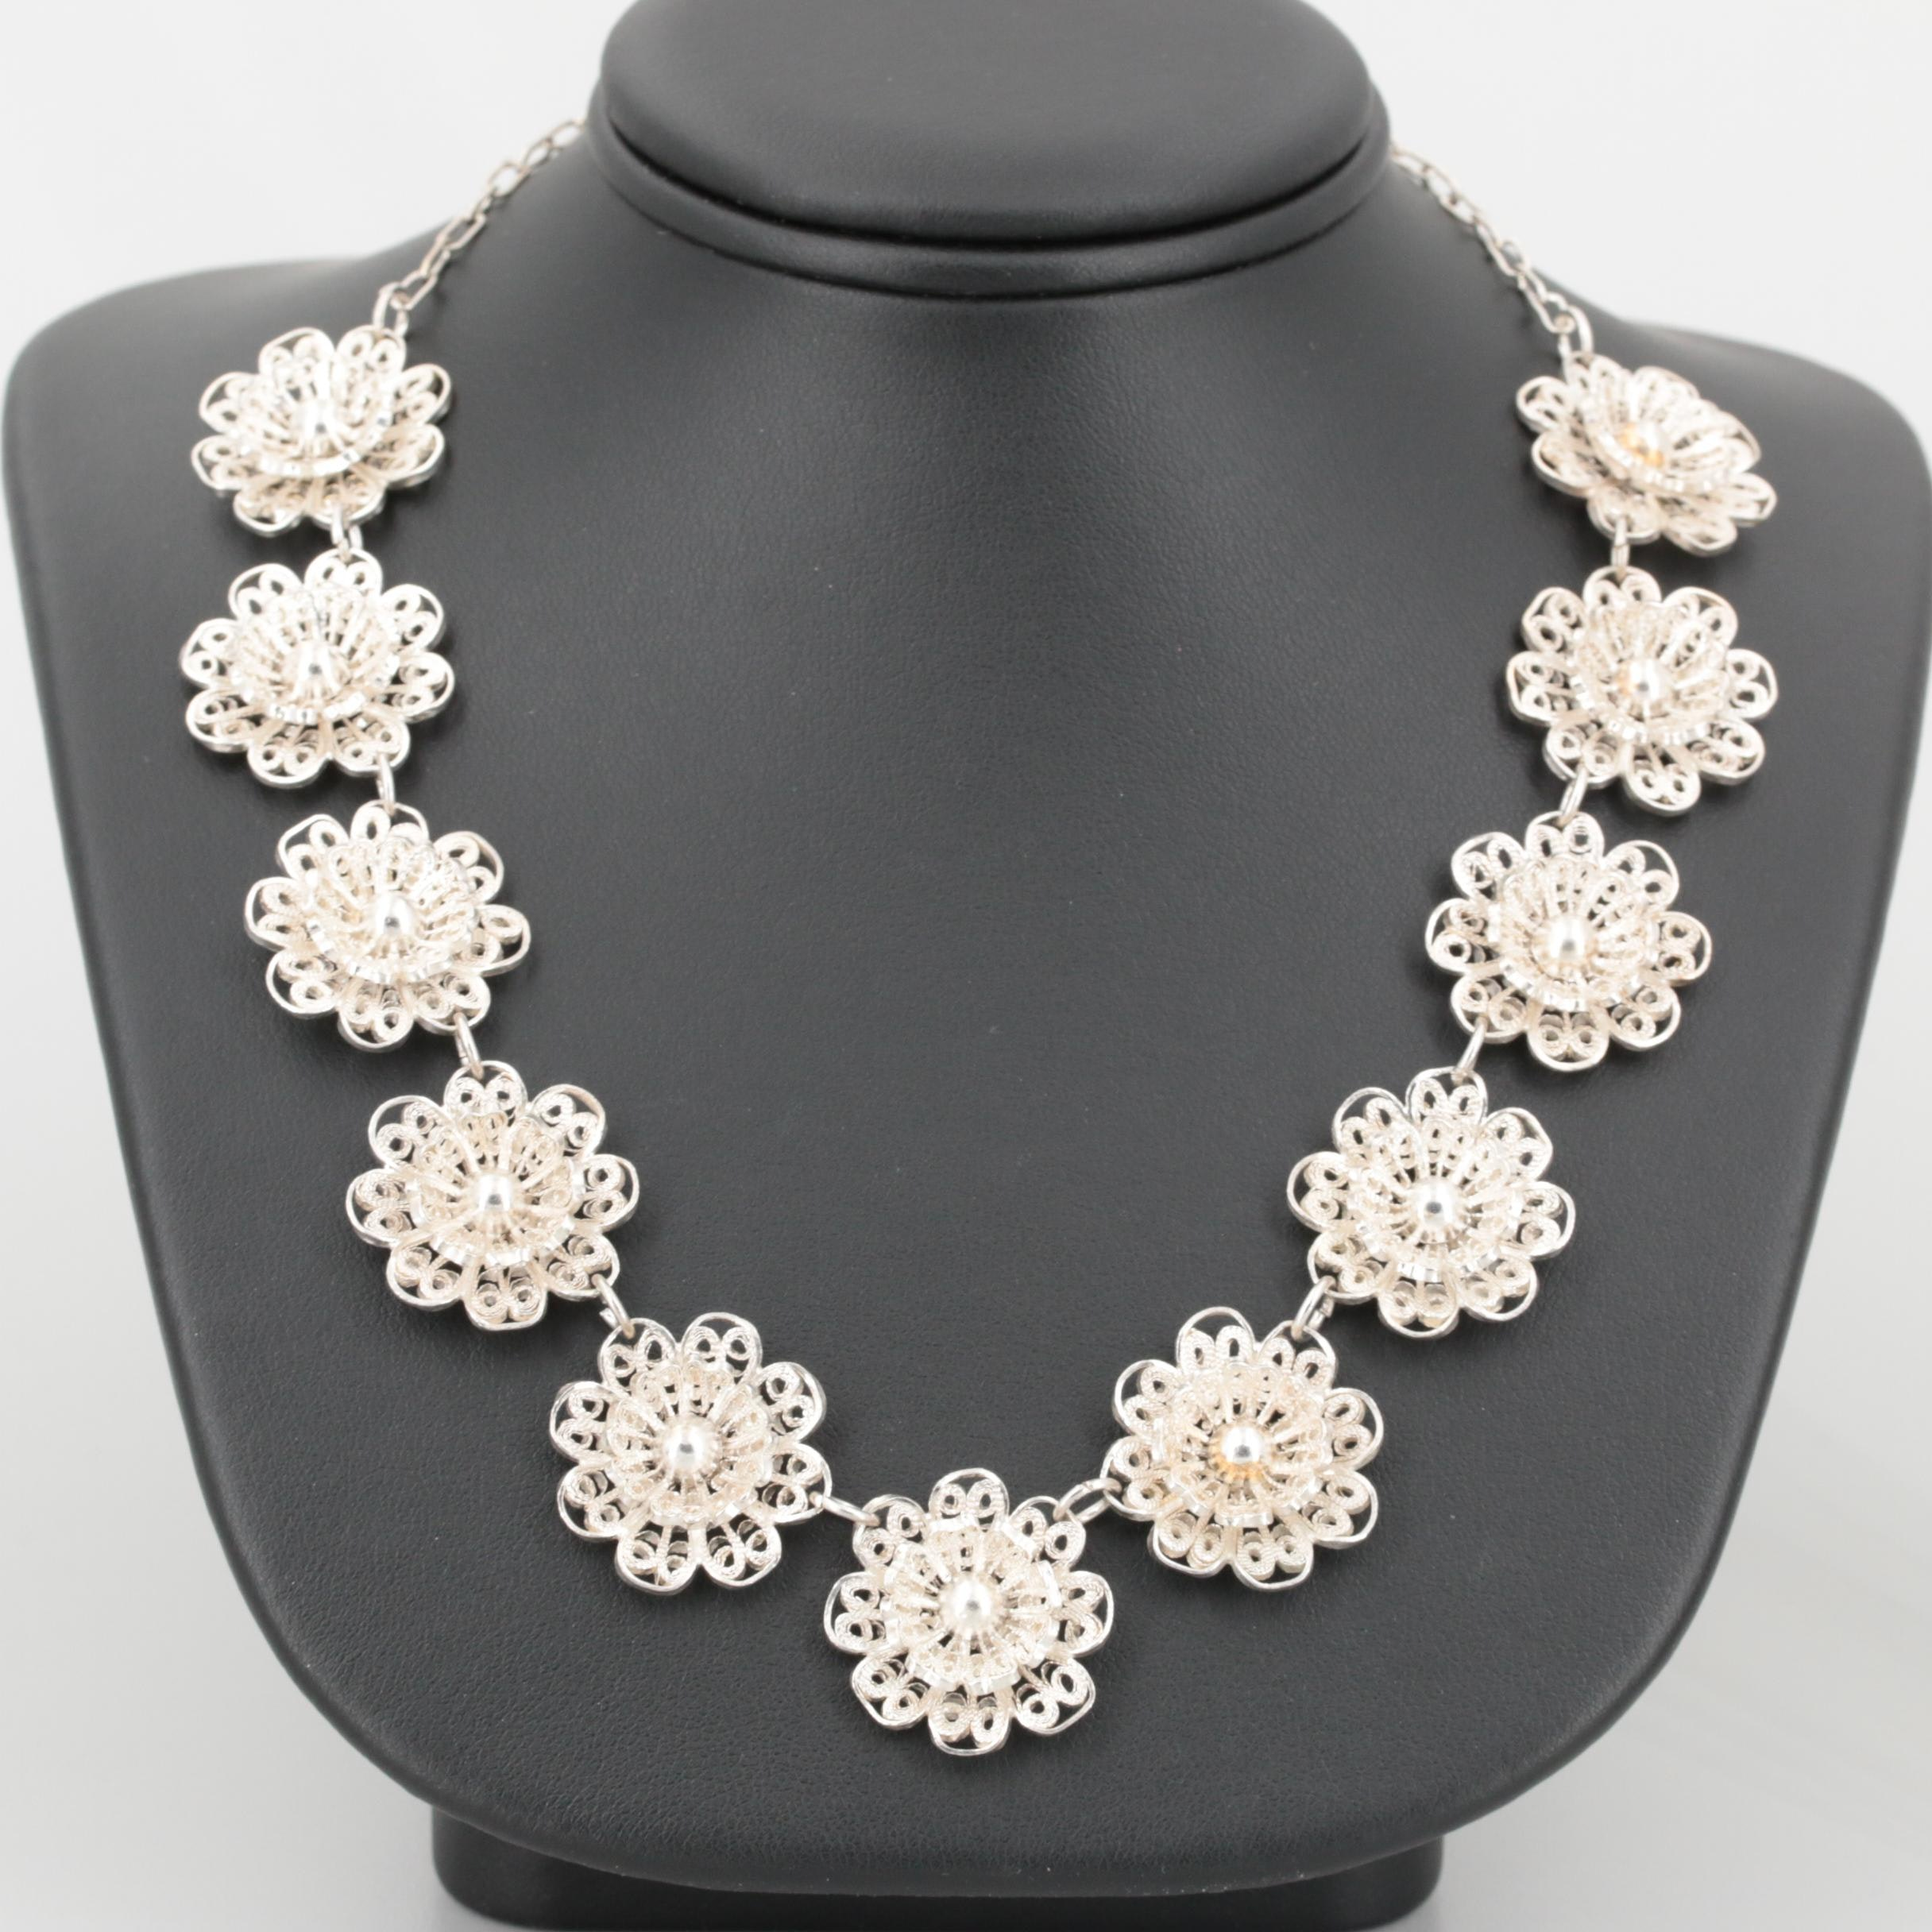 Sterling Silver Filigree Floral Motif Necklace